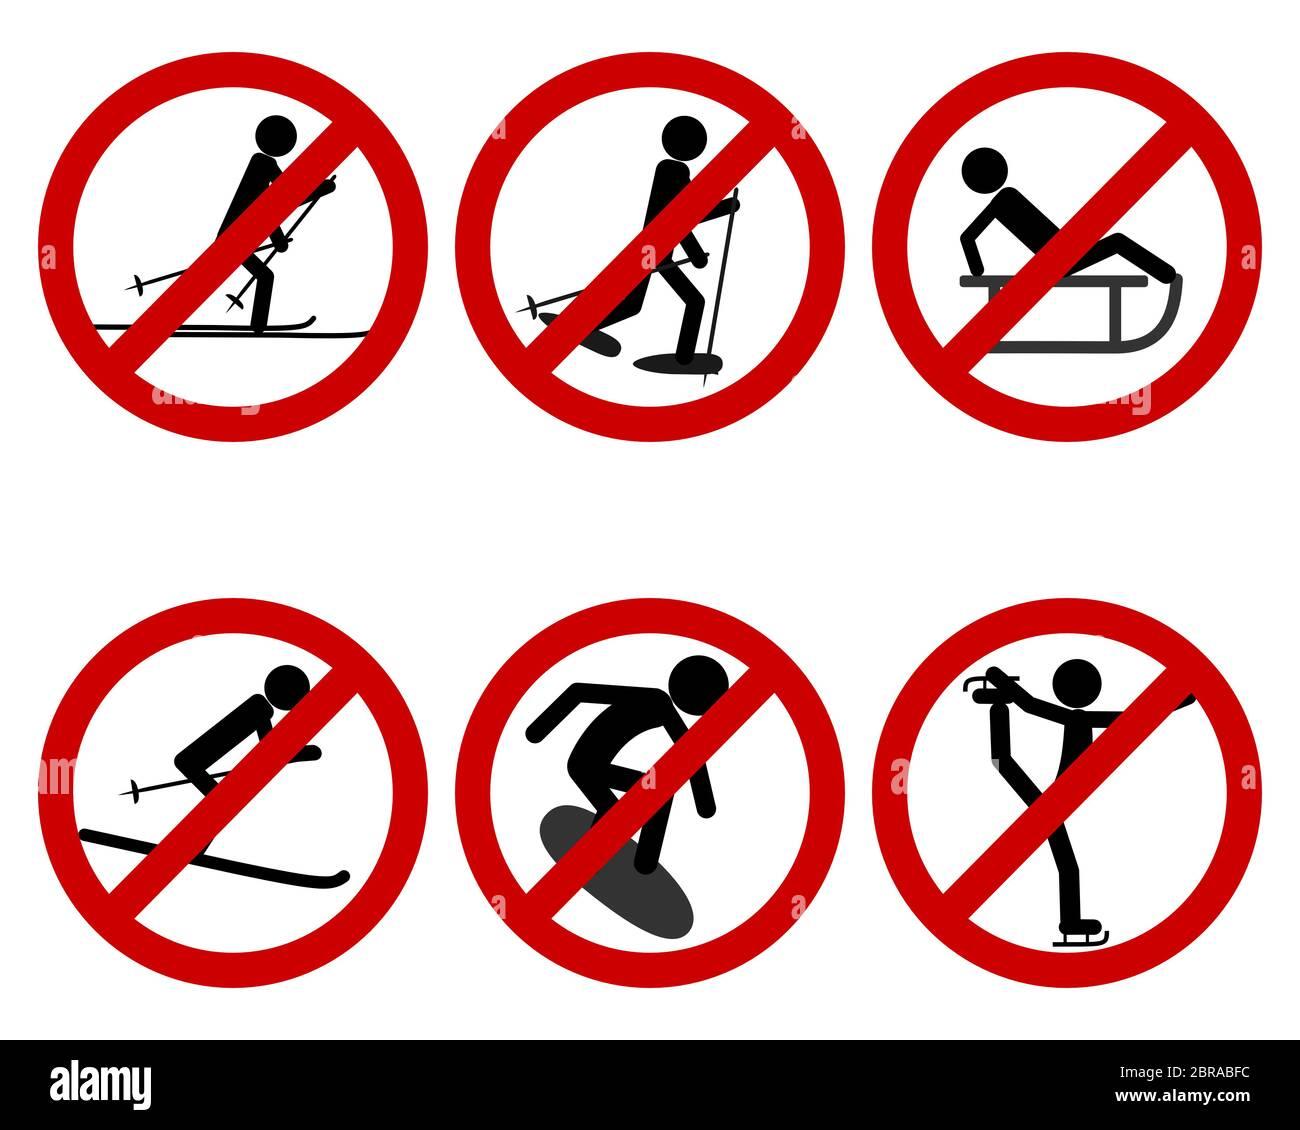 Verkehrsschild Verbot verschiedener Sportarten Stock Photo